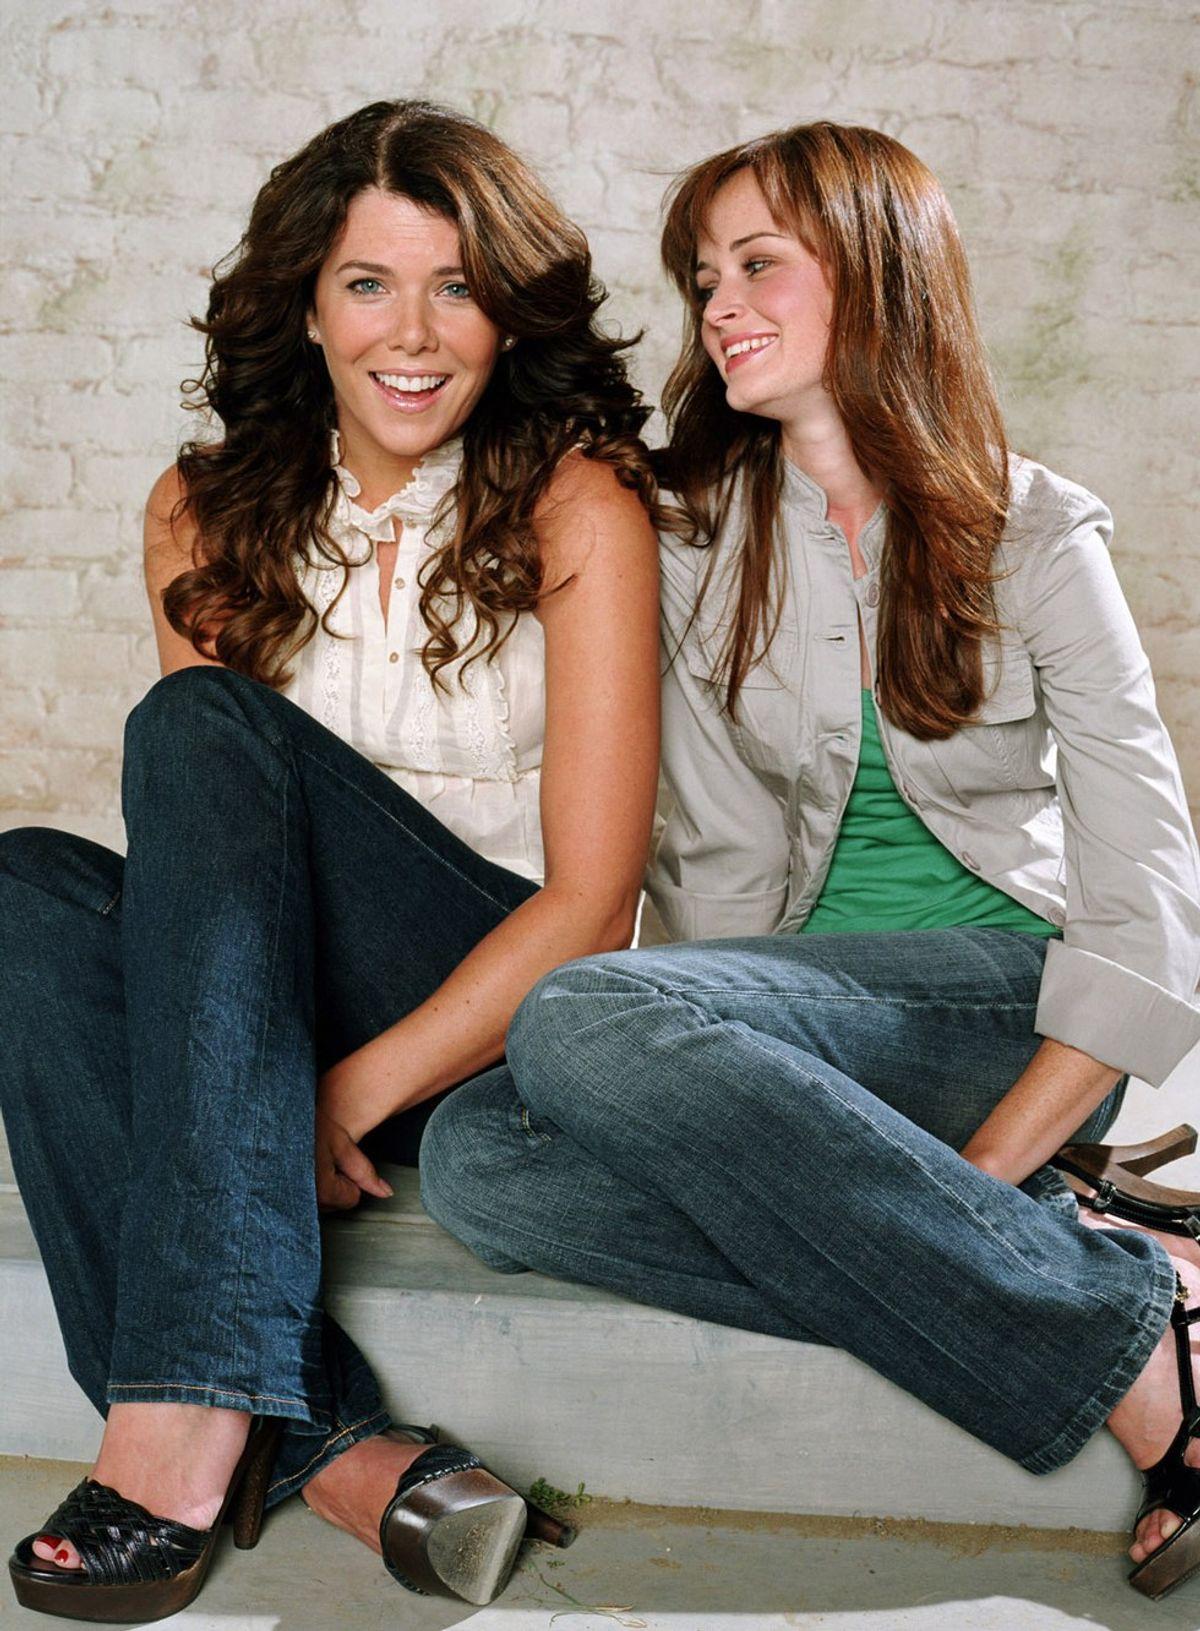 Netflix Announces 'Gilmore Girls' Revival